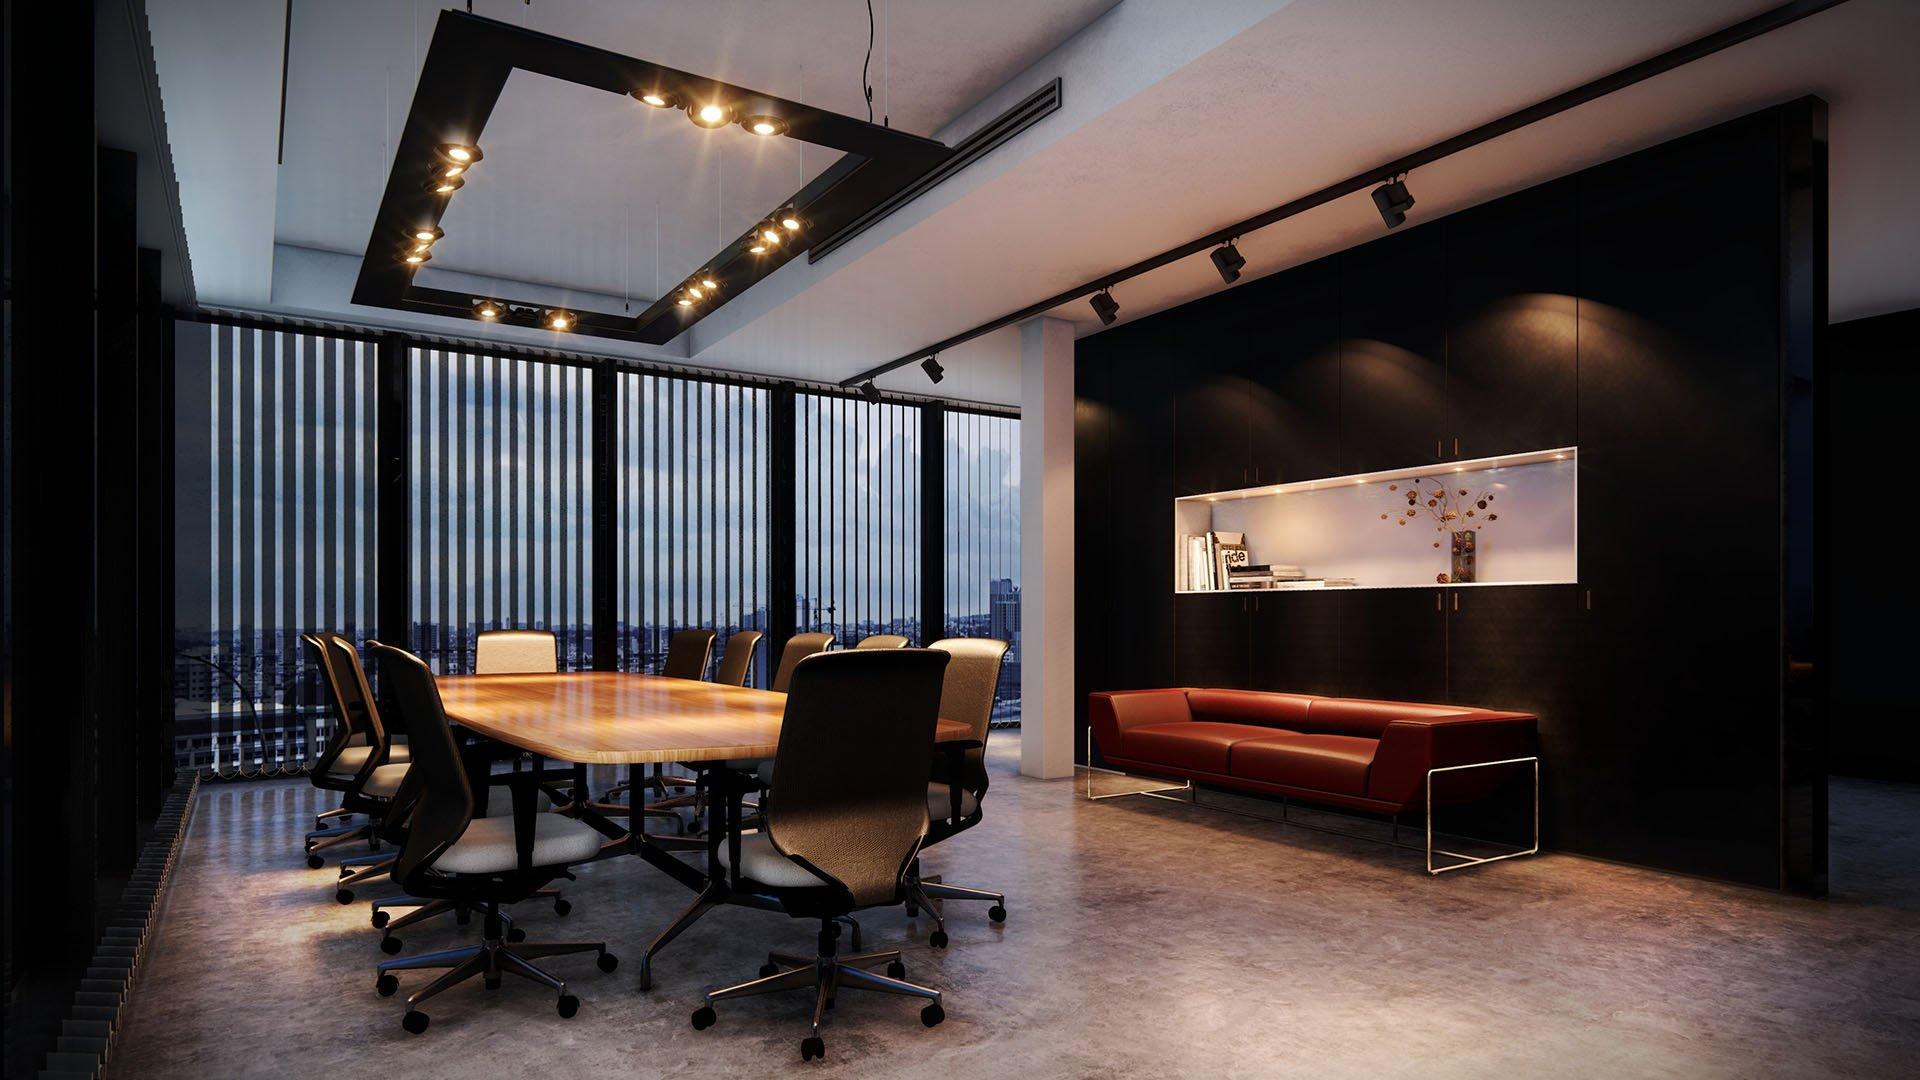 Modern House Interior Design C 243 Mo Hacer Un Render Incre 237 Ble Parte 2 Sala De Conferencias